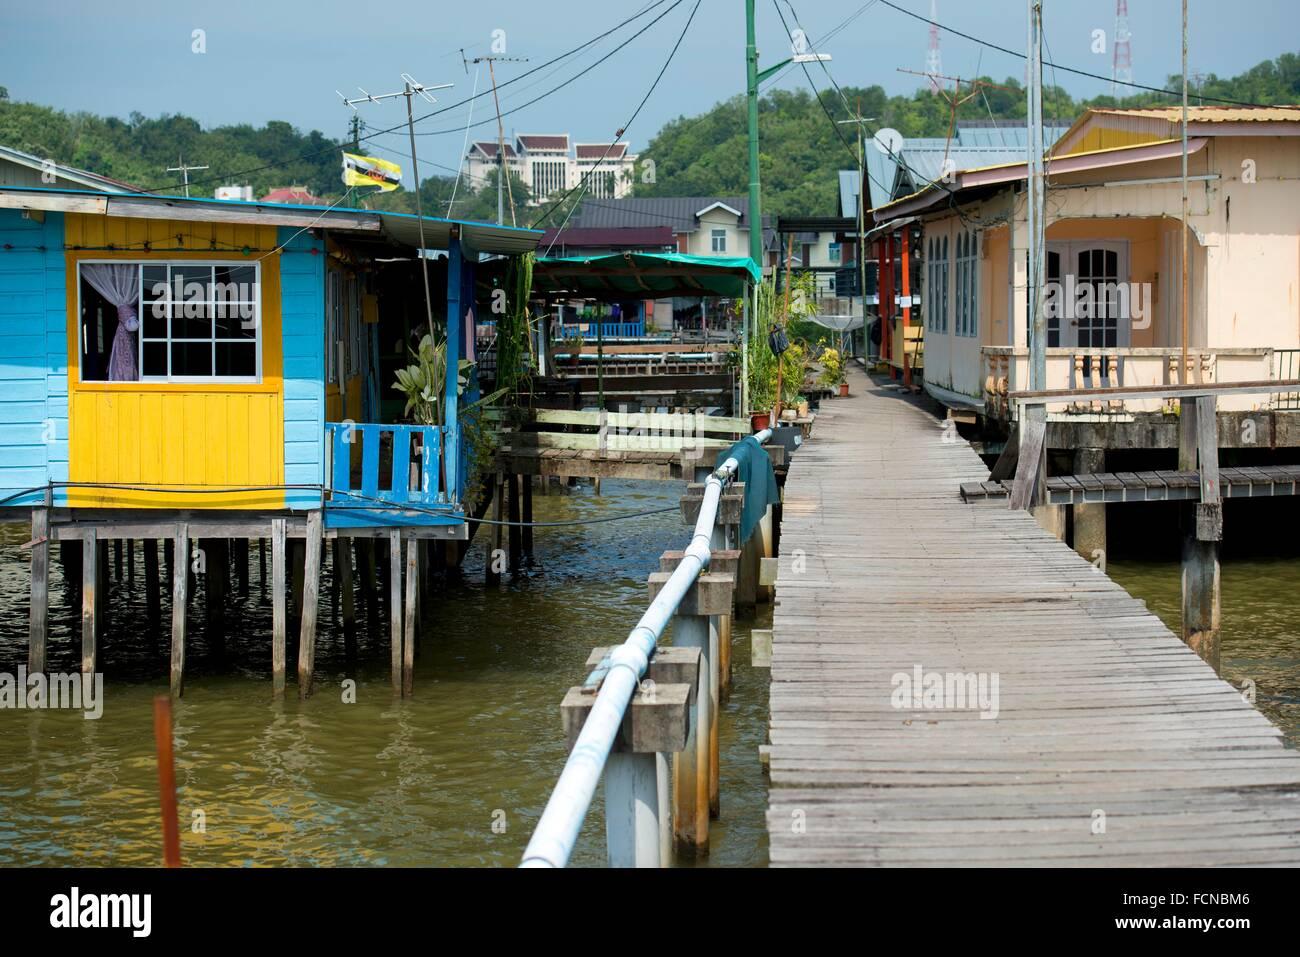 Walkway and shacks on stilts in Brunei River, Water Village (Kampong Ayer), Bandar Seri Begawan, Brunei. - Stock Image